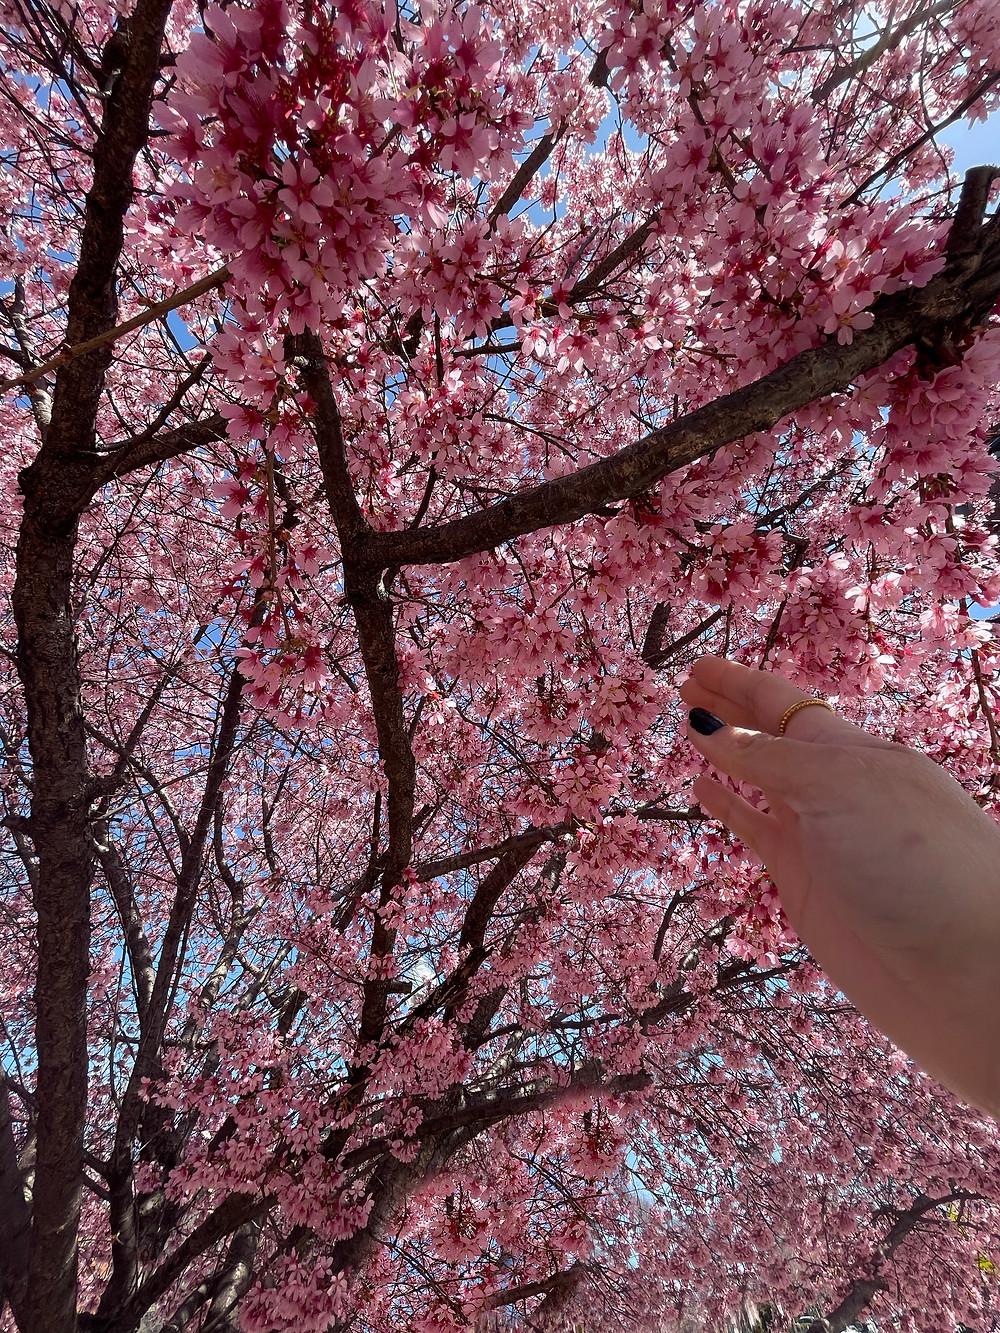 Árboles de cerezos en LeDetroit Park en Washington, D.C.